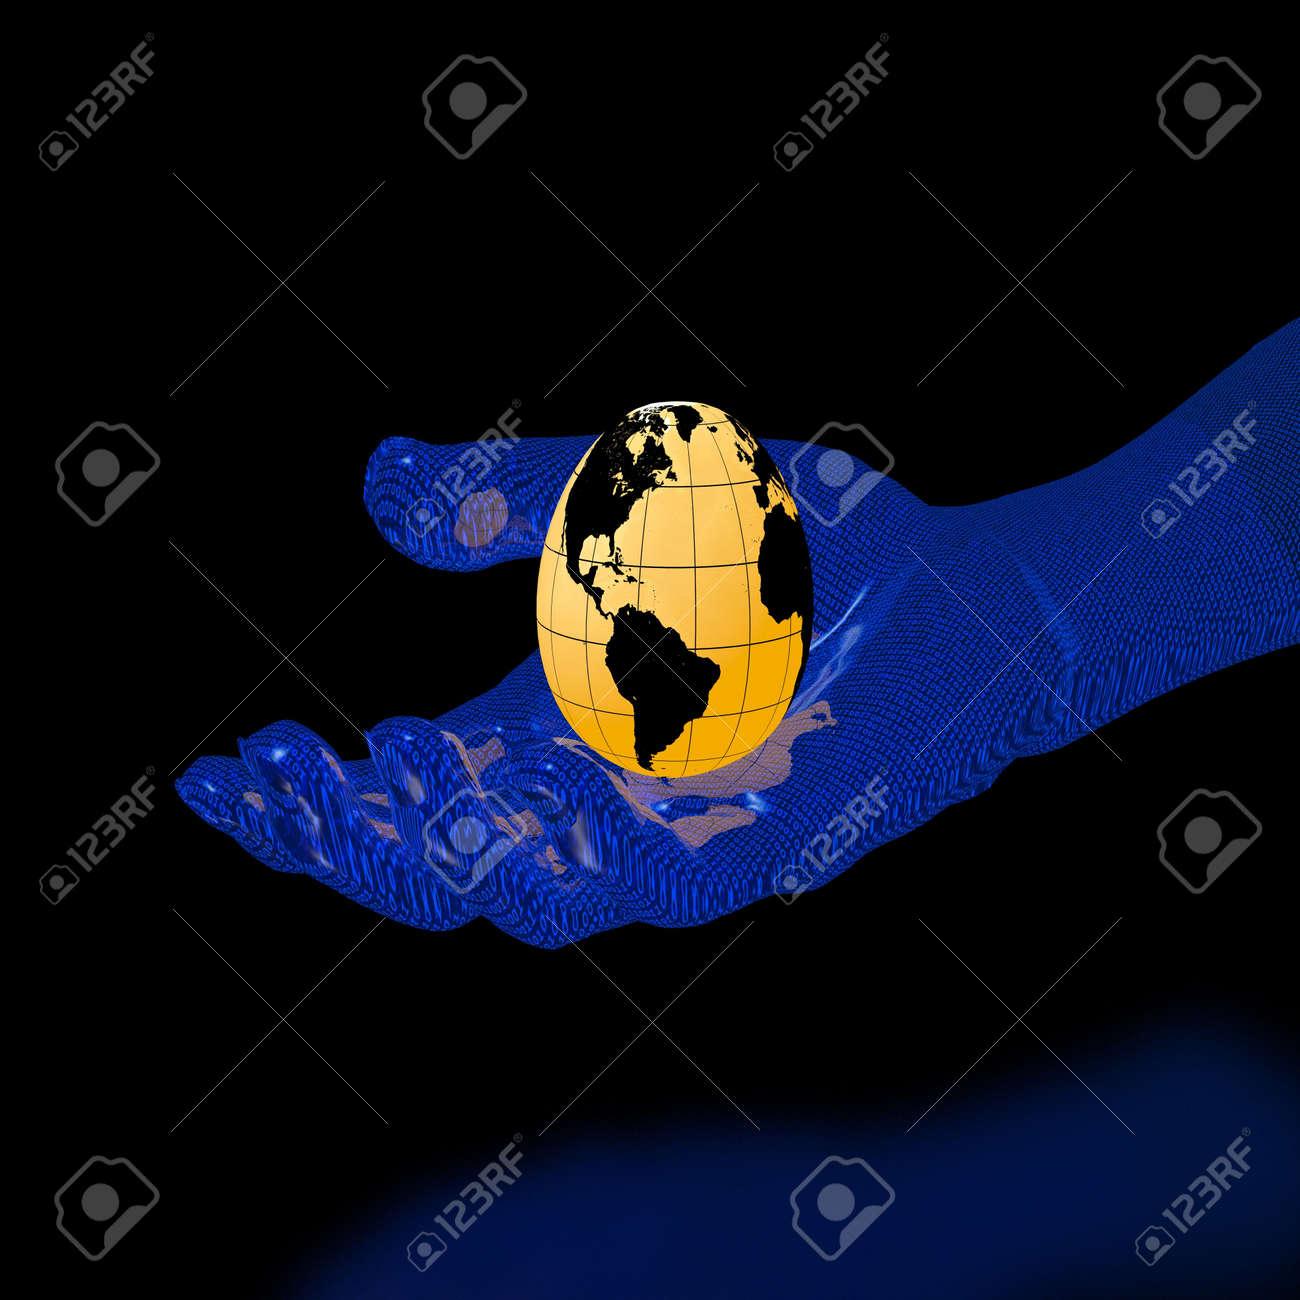 globe-egg on binary hand (high resolution 3D image) Stock Photo - 2667468